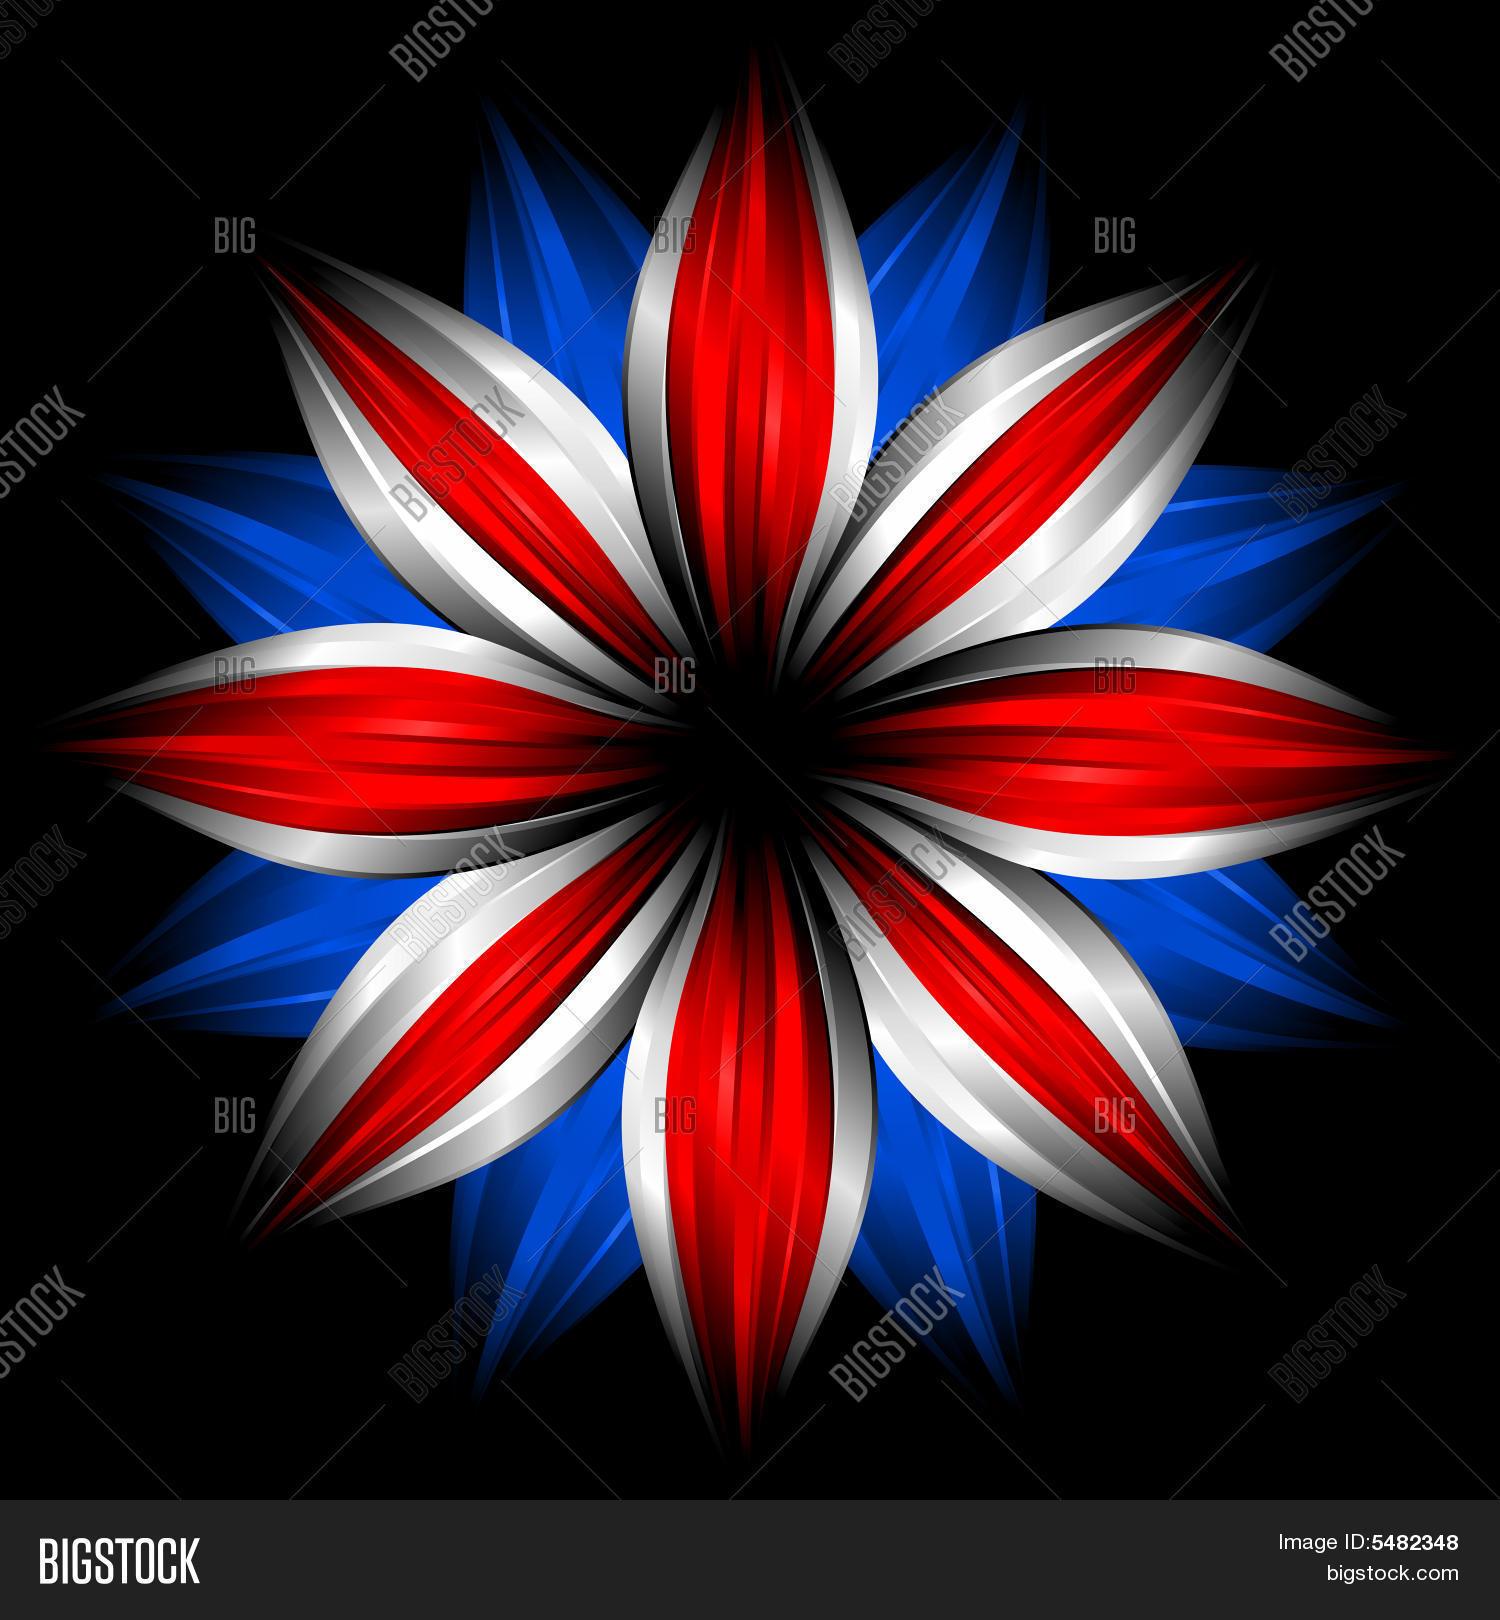 Flower British Flag Image & Photo (Free Trial) | Bigstock